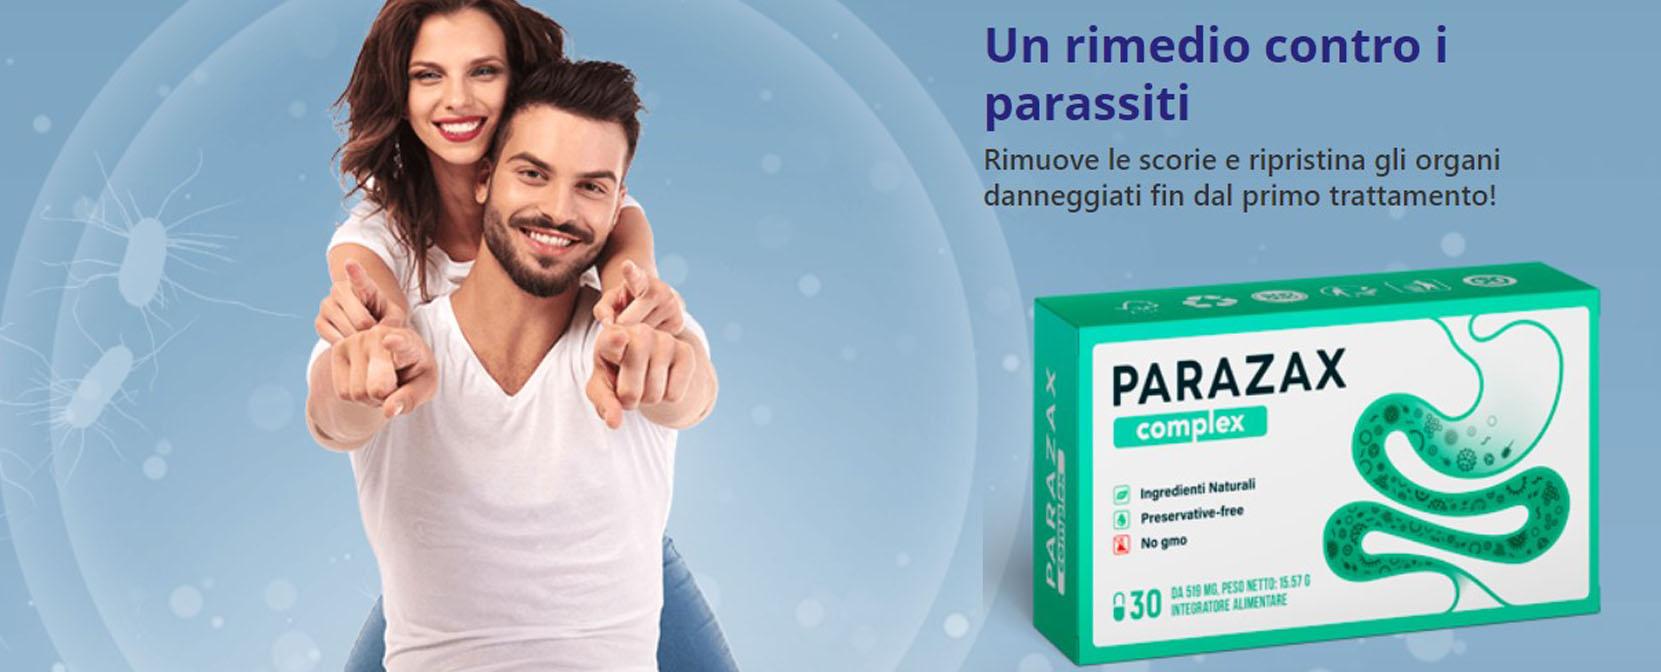 integratore parazax